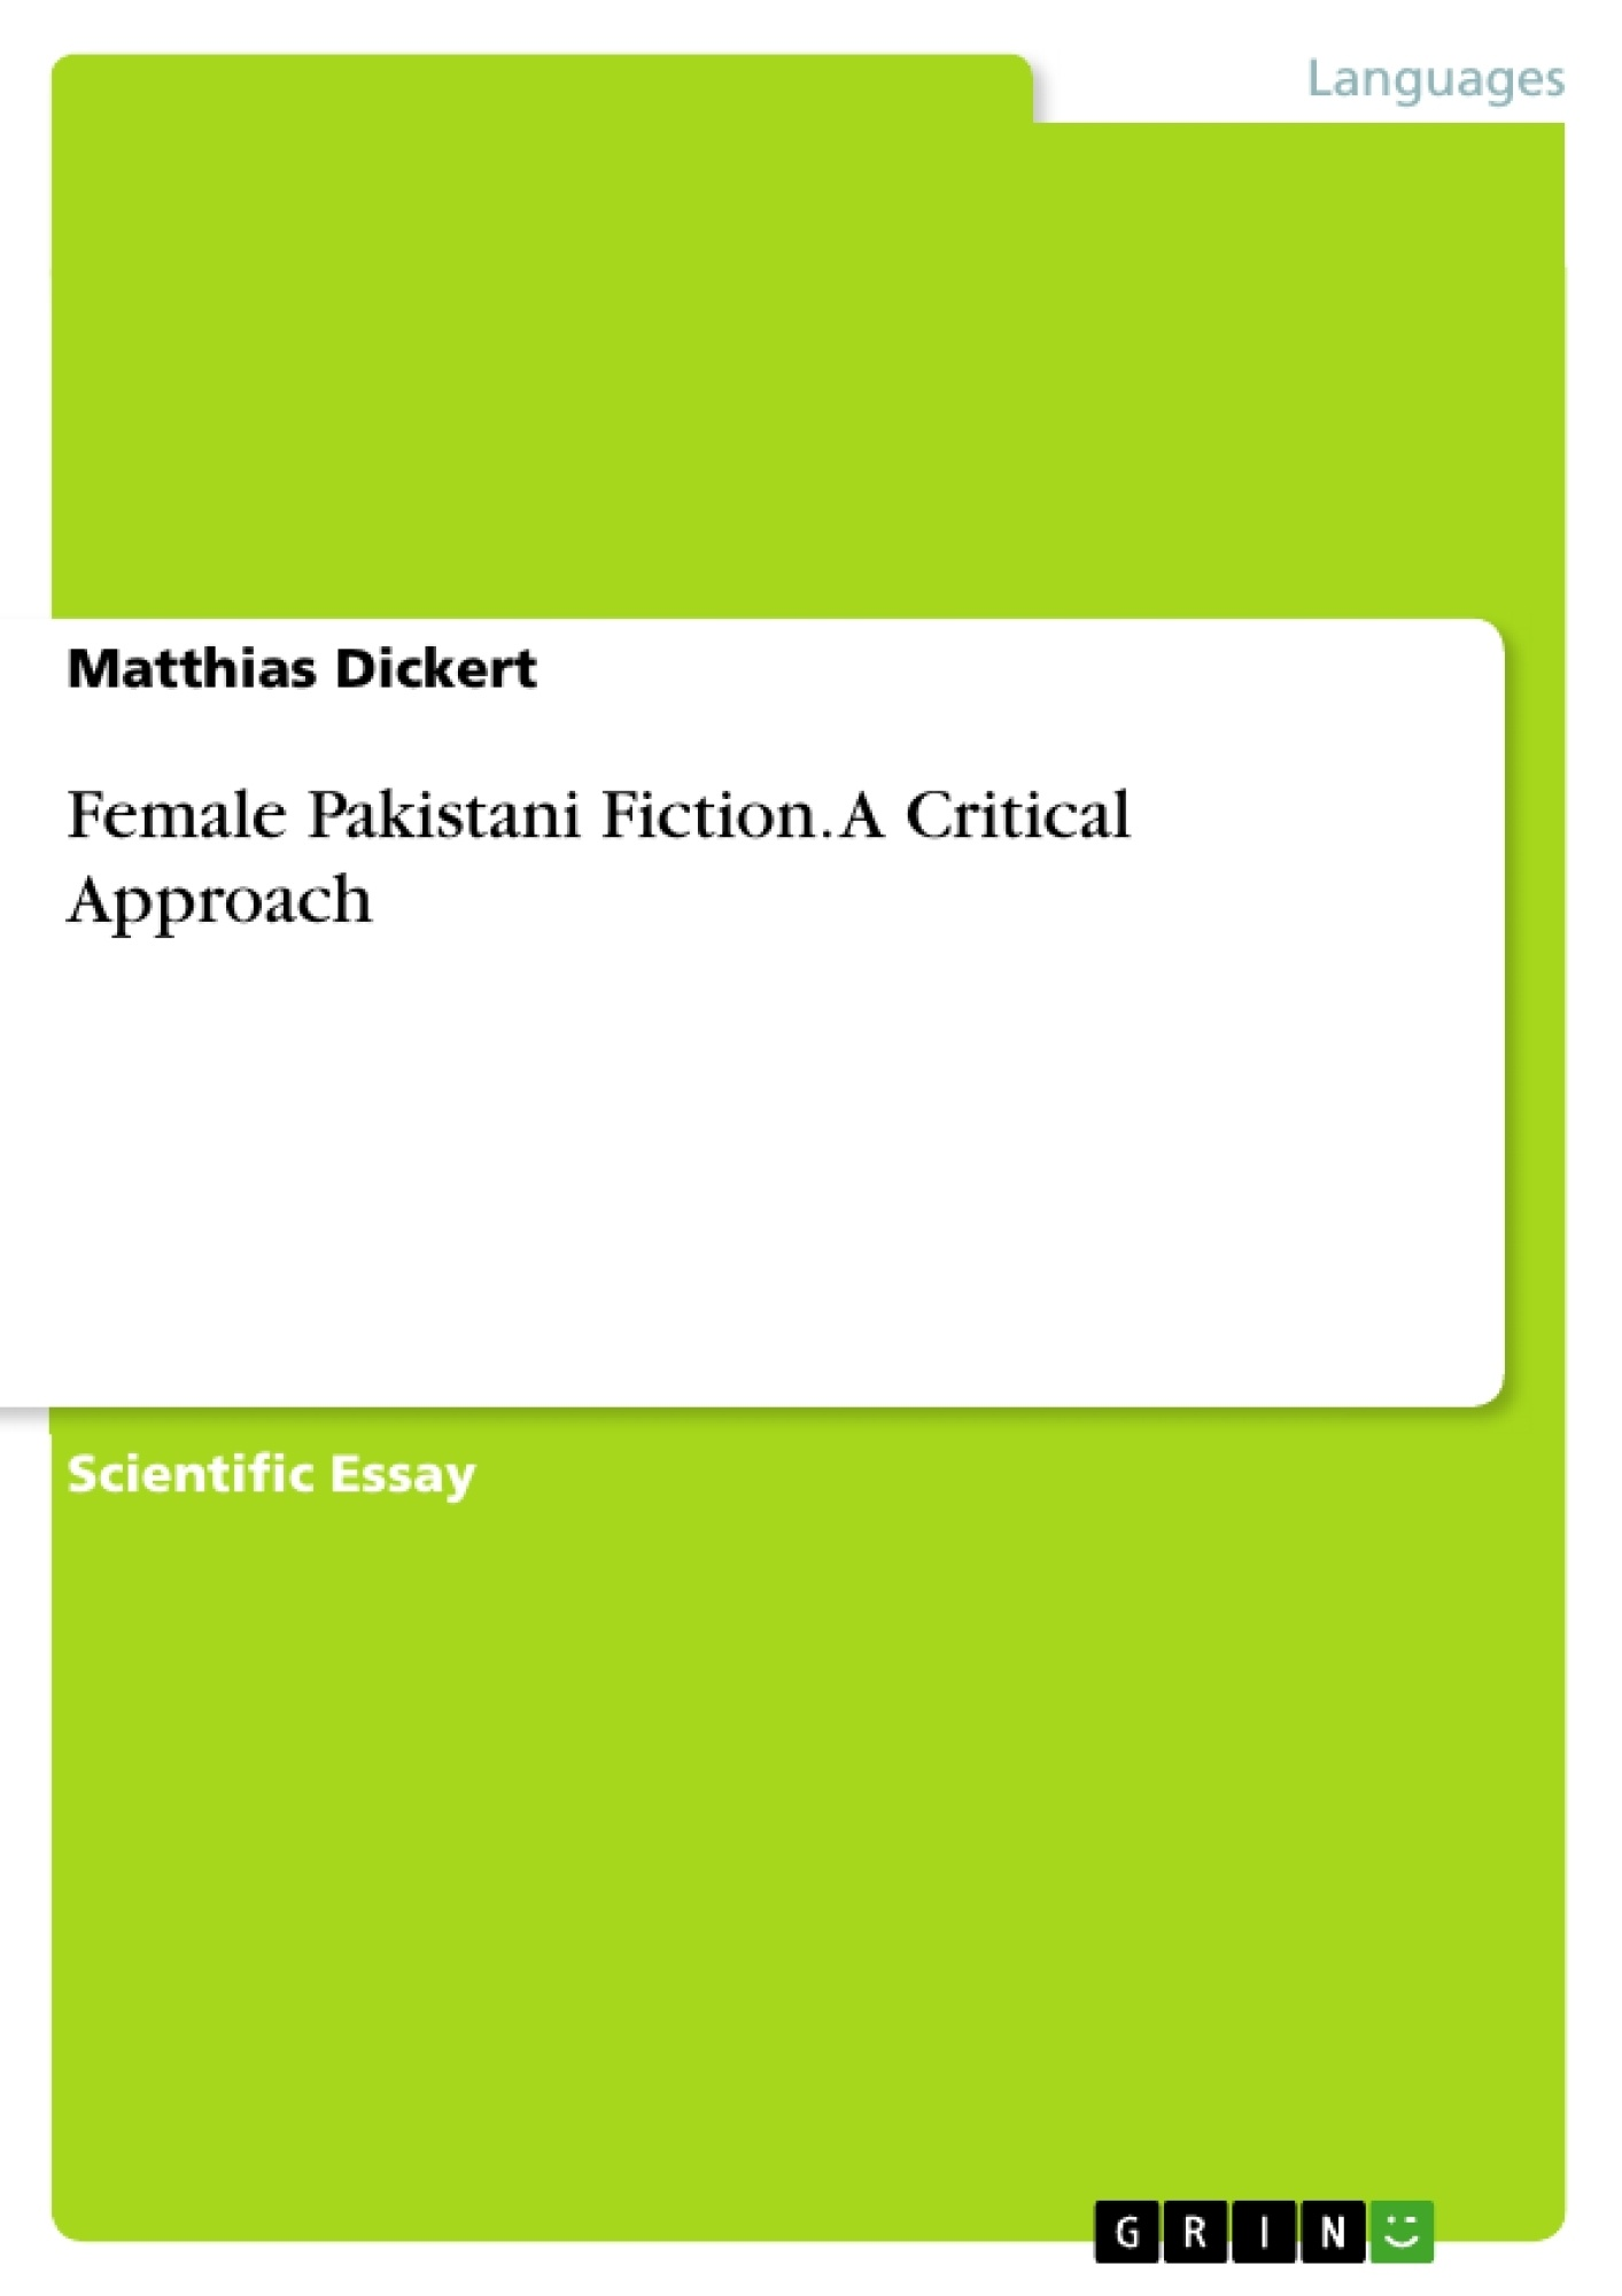 GRIN - Female Pakistani Fiction  A Critical Approach